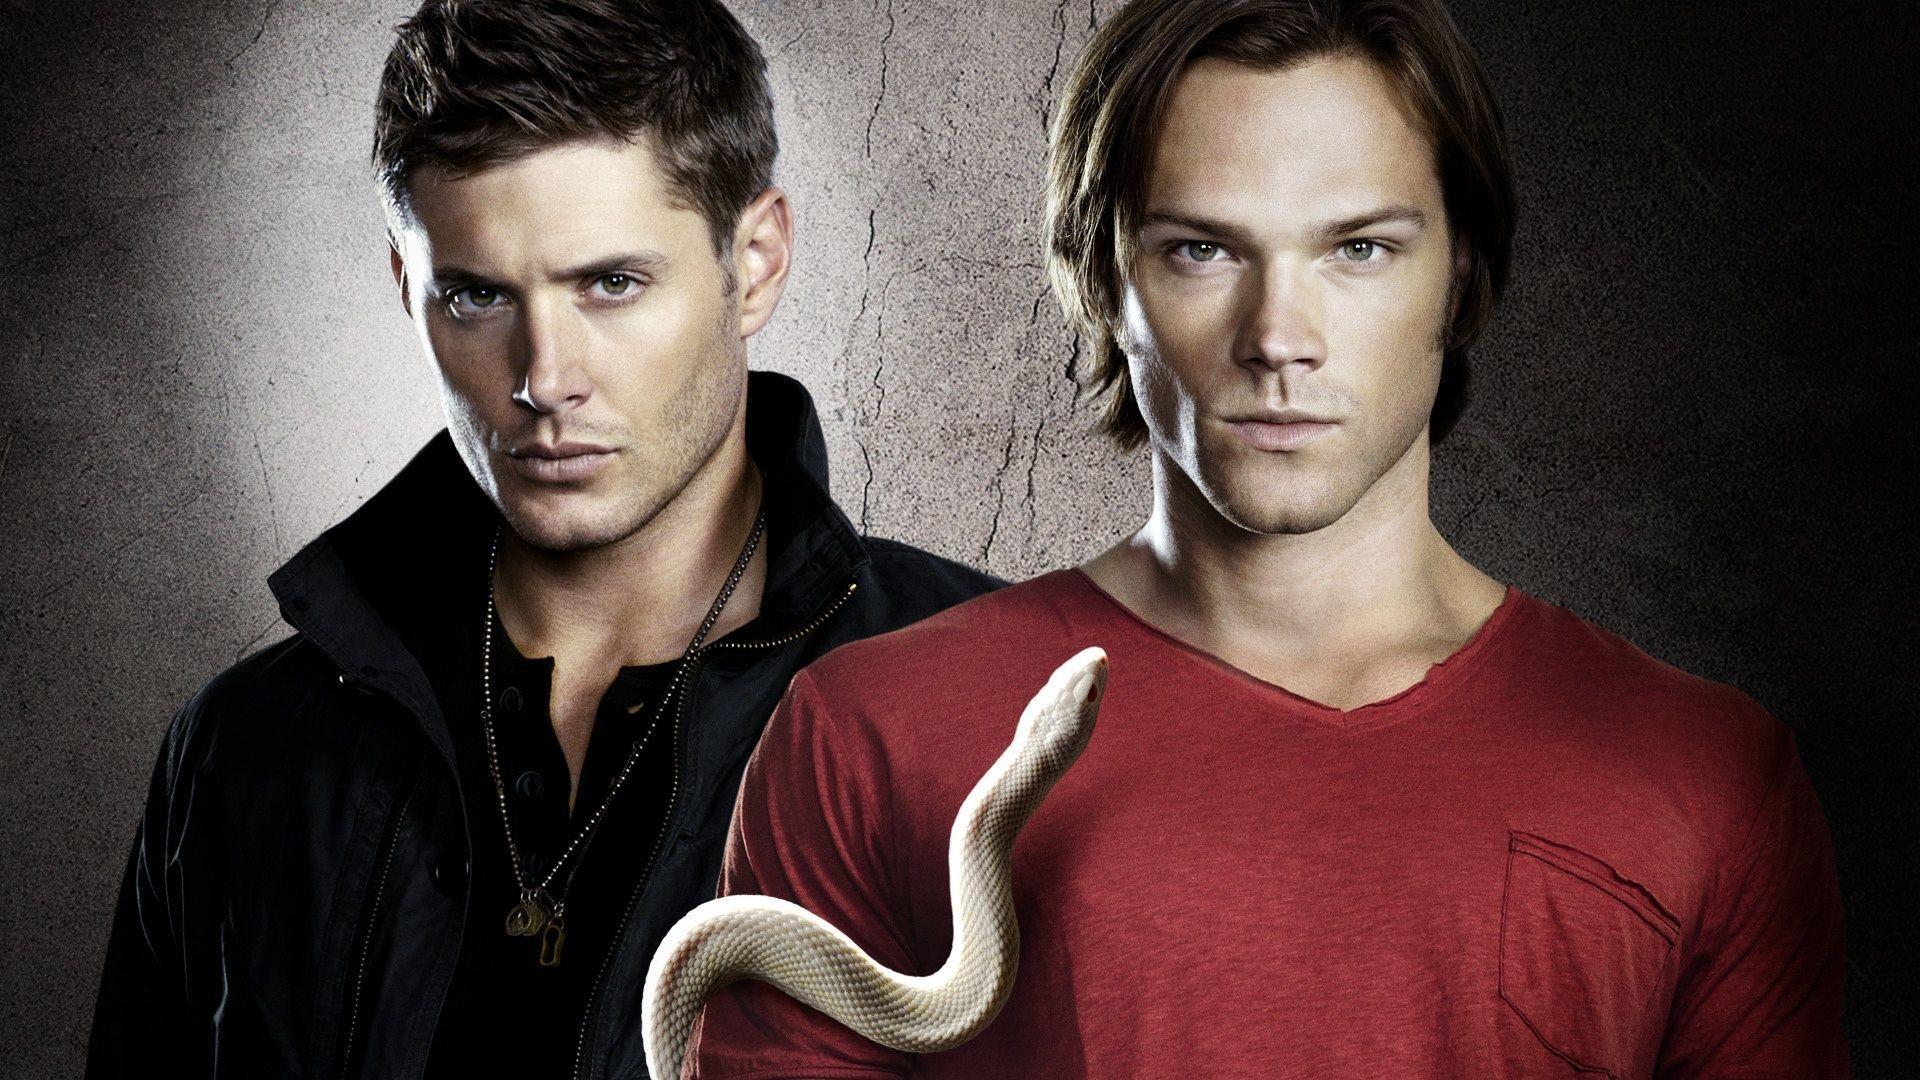 Supernatural: Sam and Dean HD Wallpaper   Download HD Wallpapers